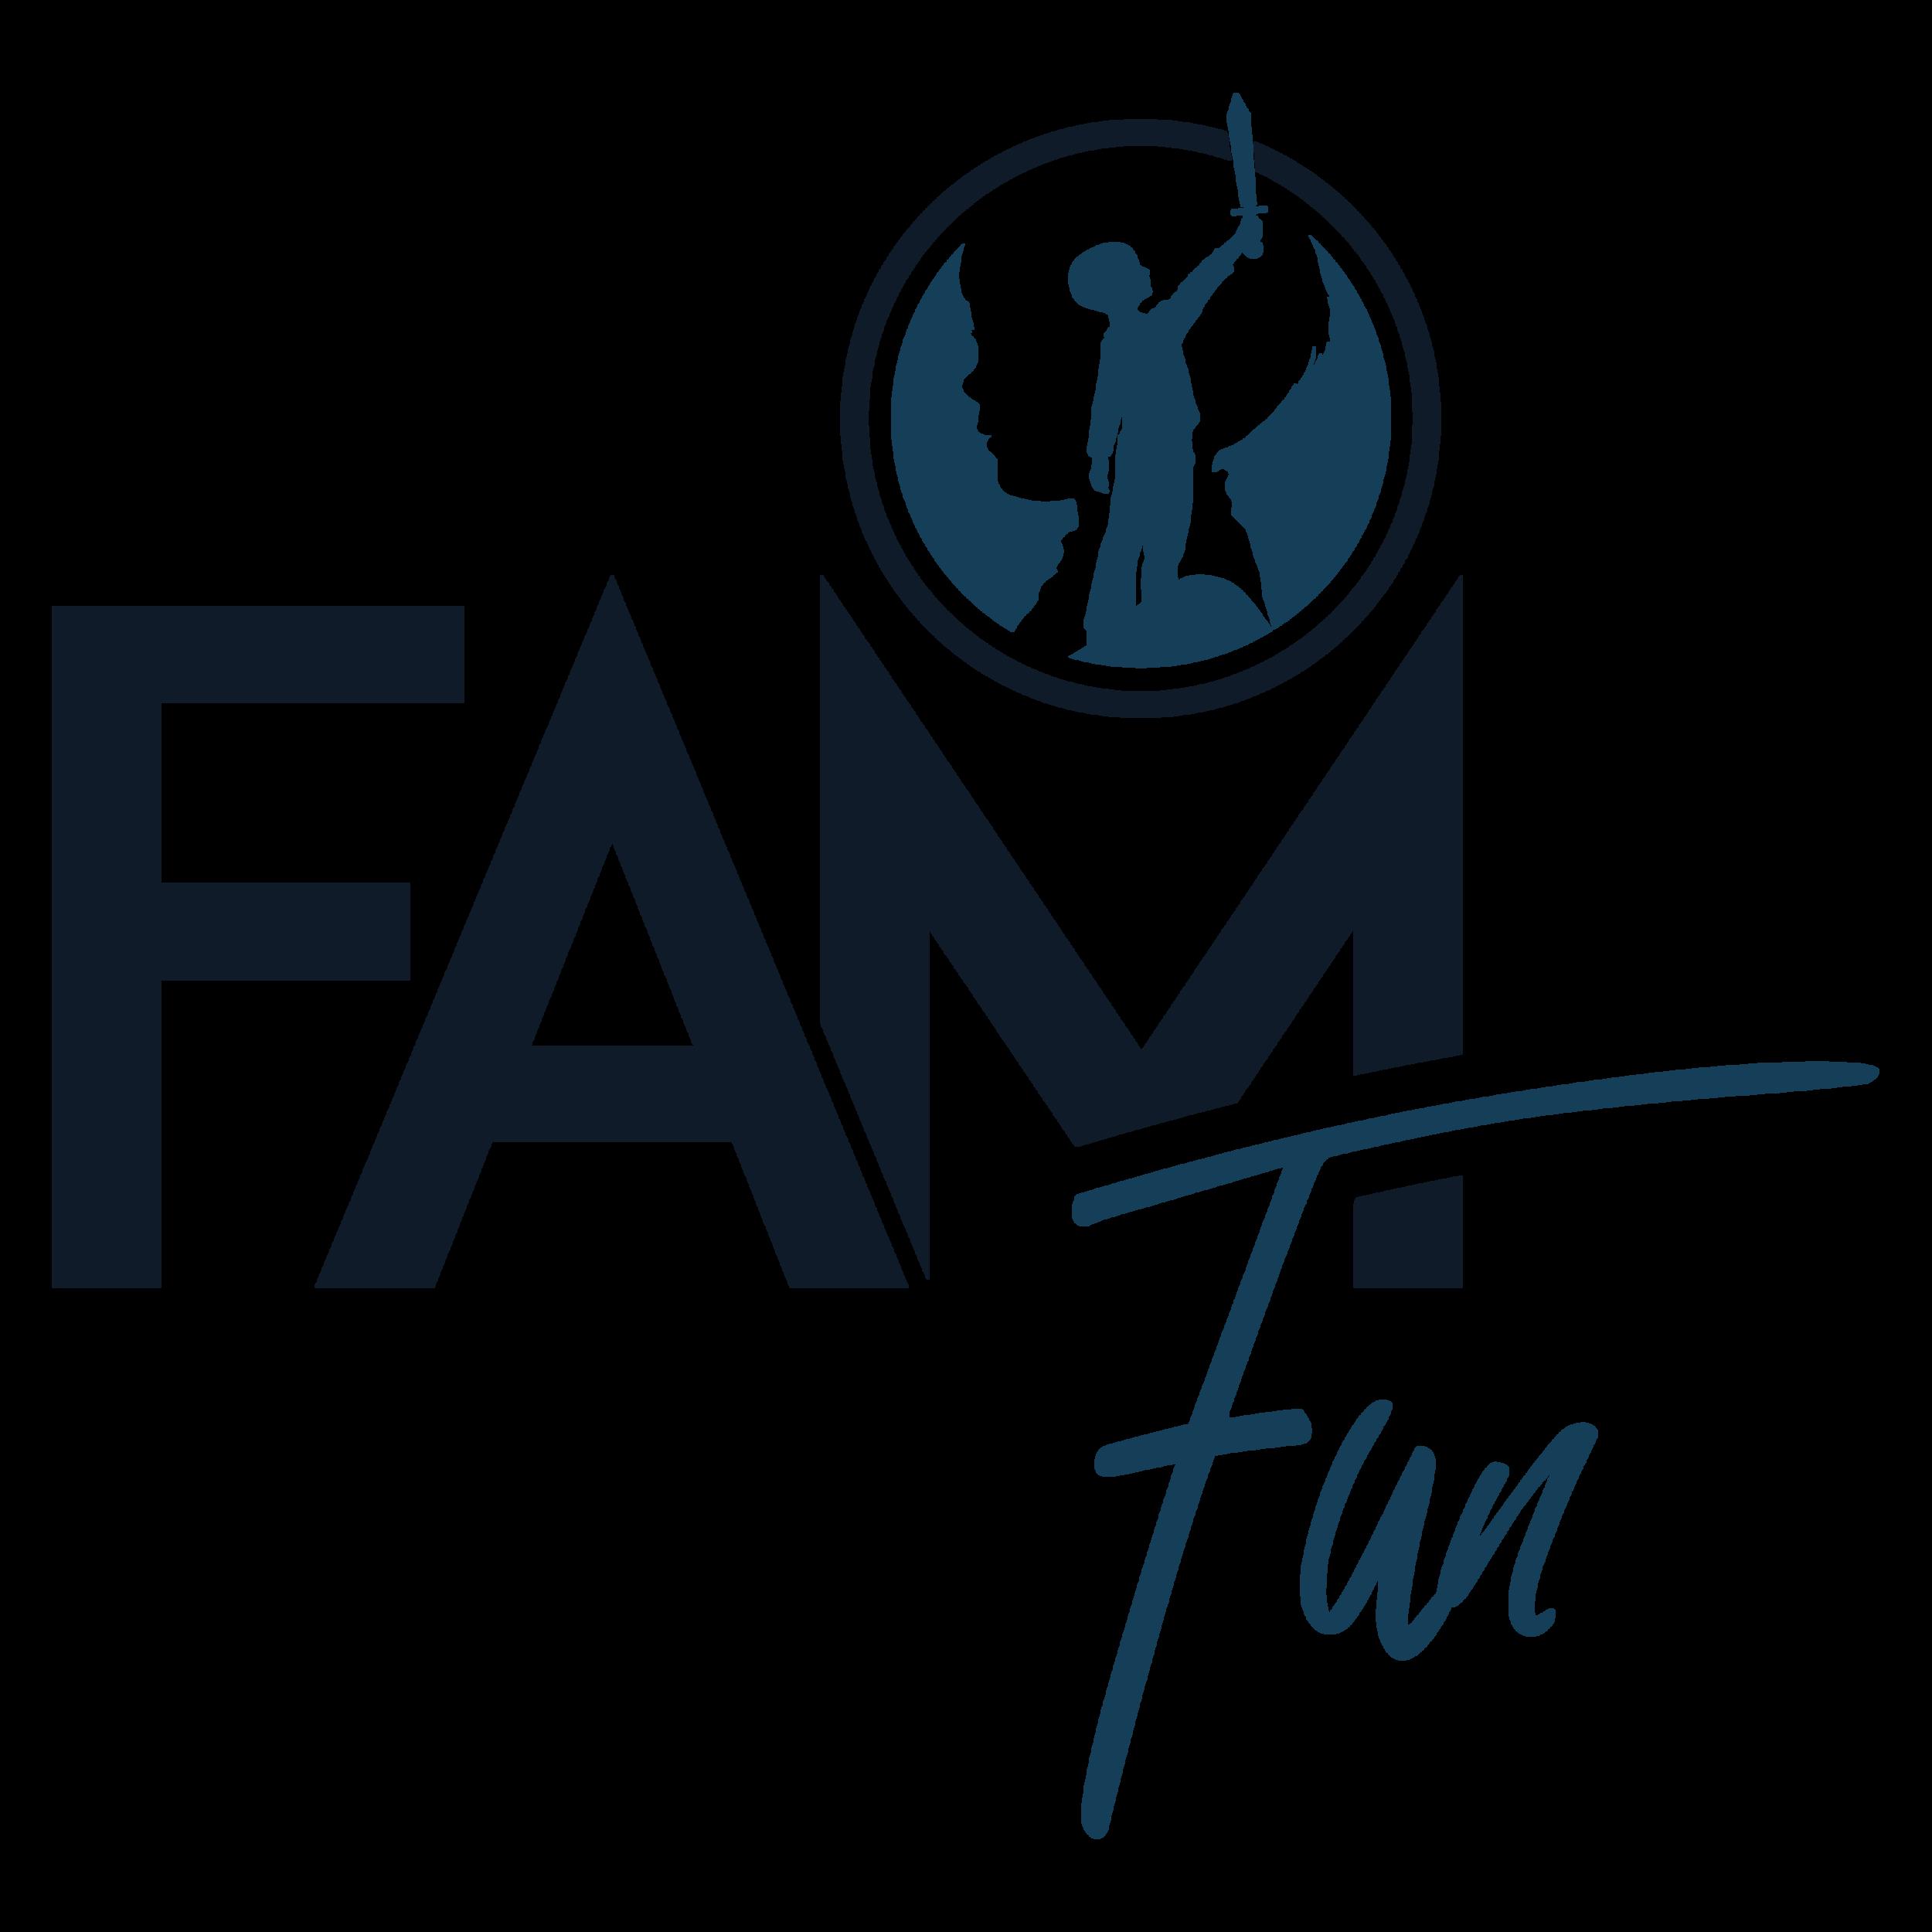 FAM_SERVICE_Logos_2019-05.png